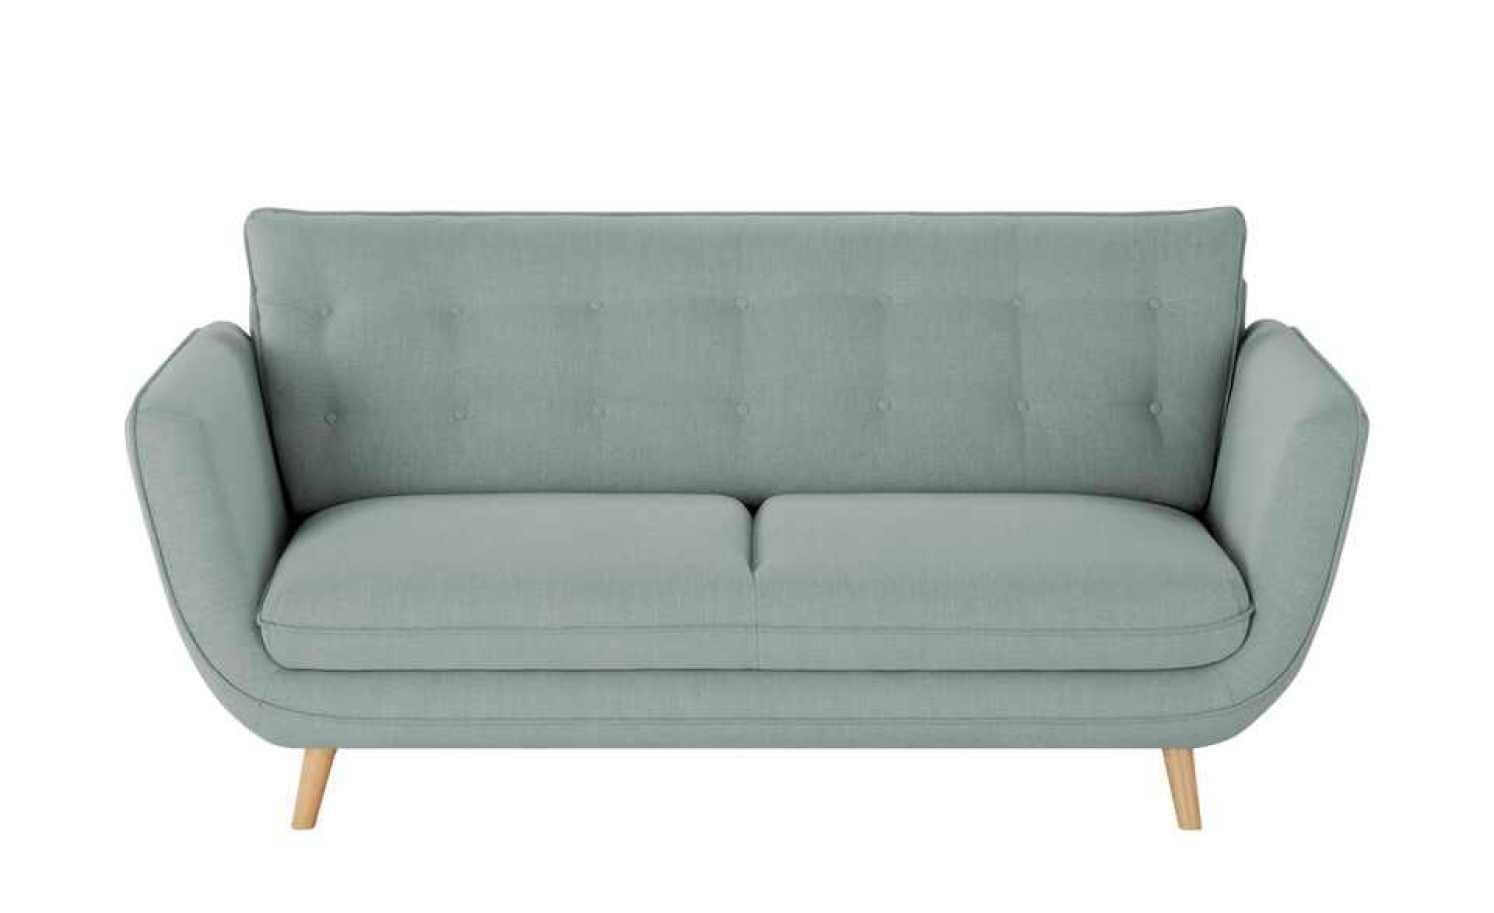 Sofa STOCKHOLM von FINYA